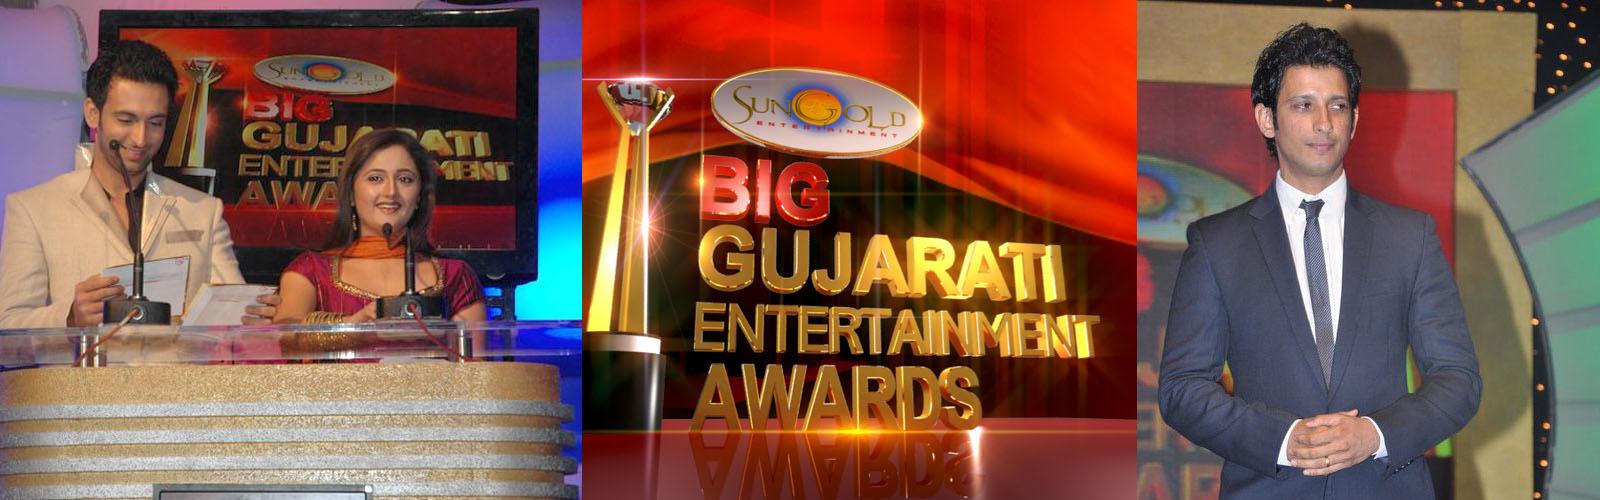 Sungold Big Gujarati Entertainment Award 2010